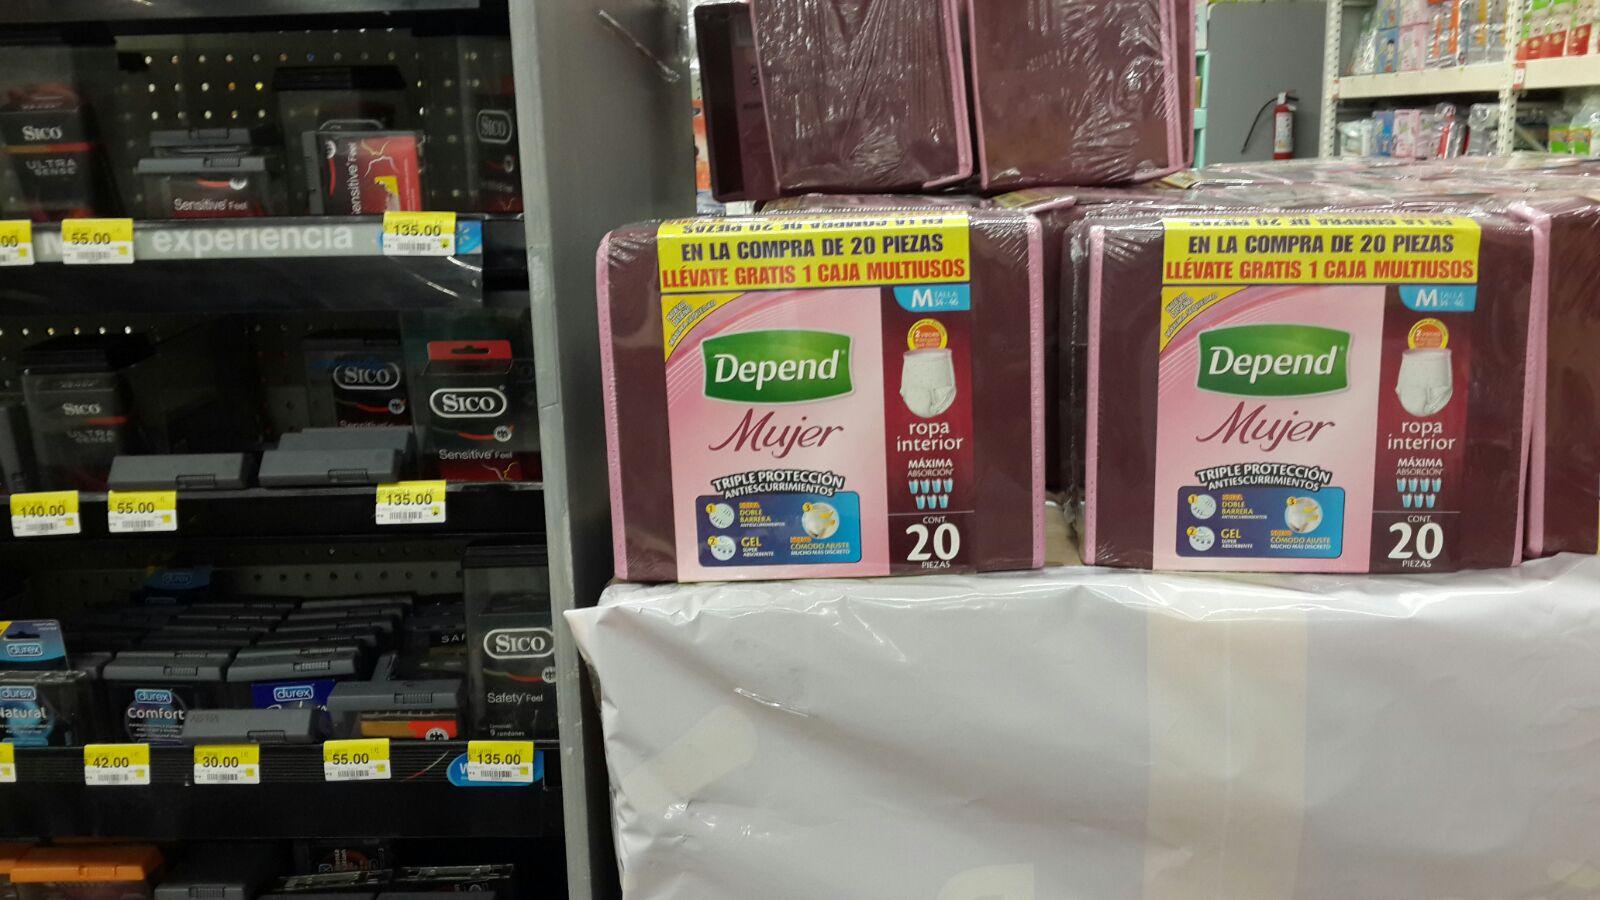 Walmart: Pañales para adultos DEPEND de $185 a $35.01